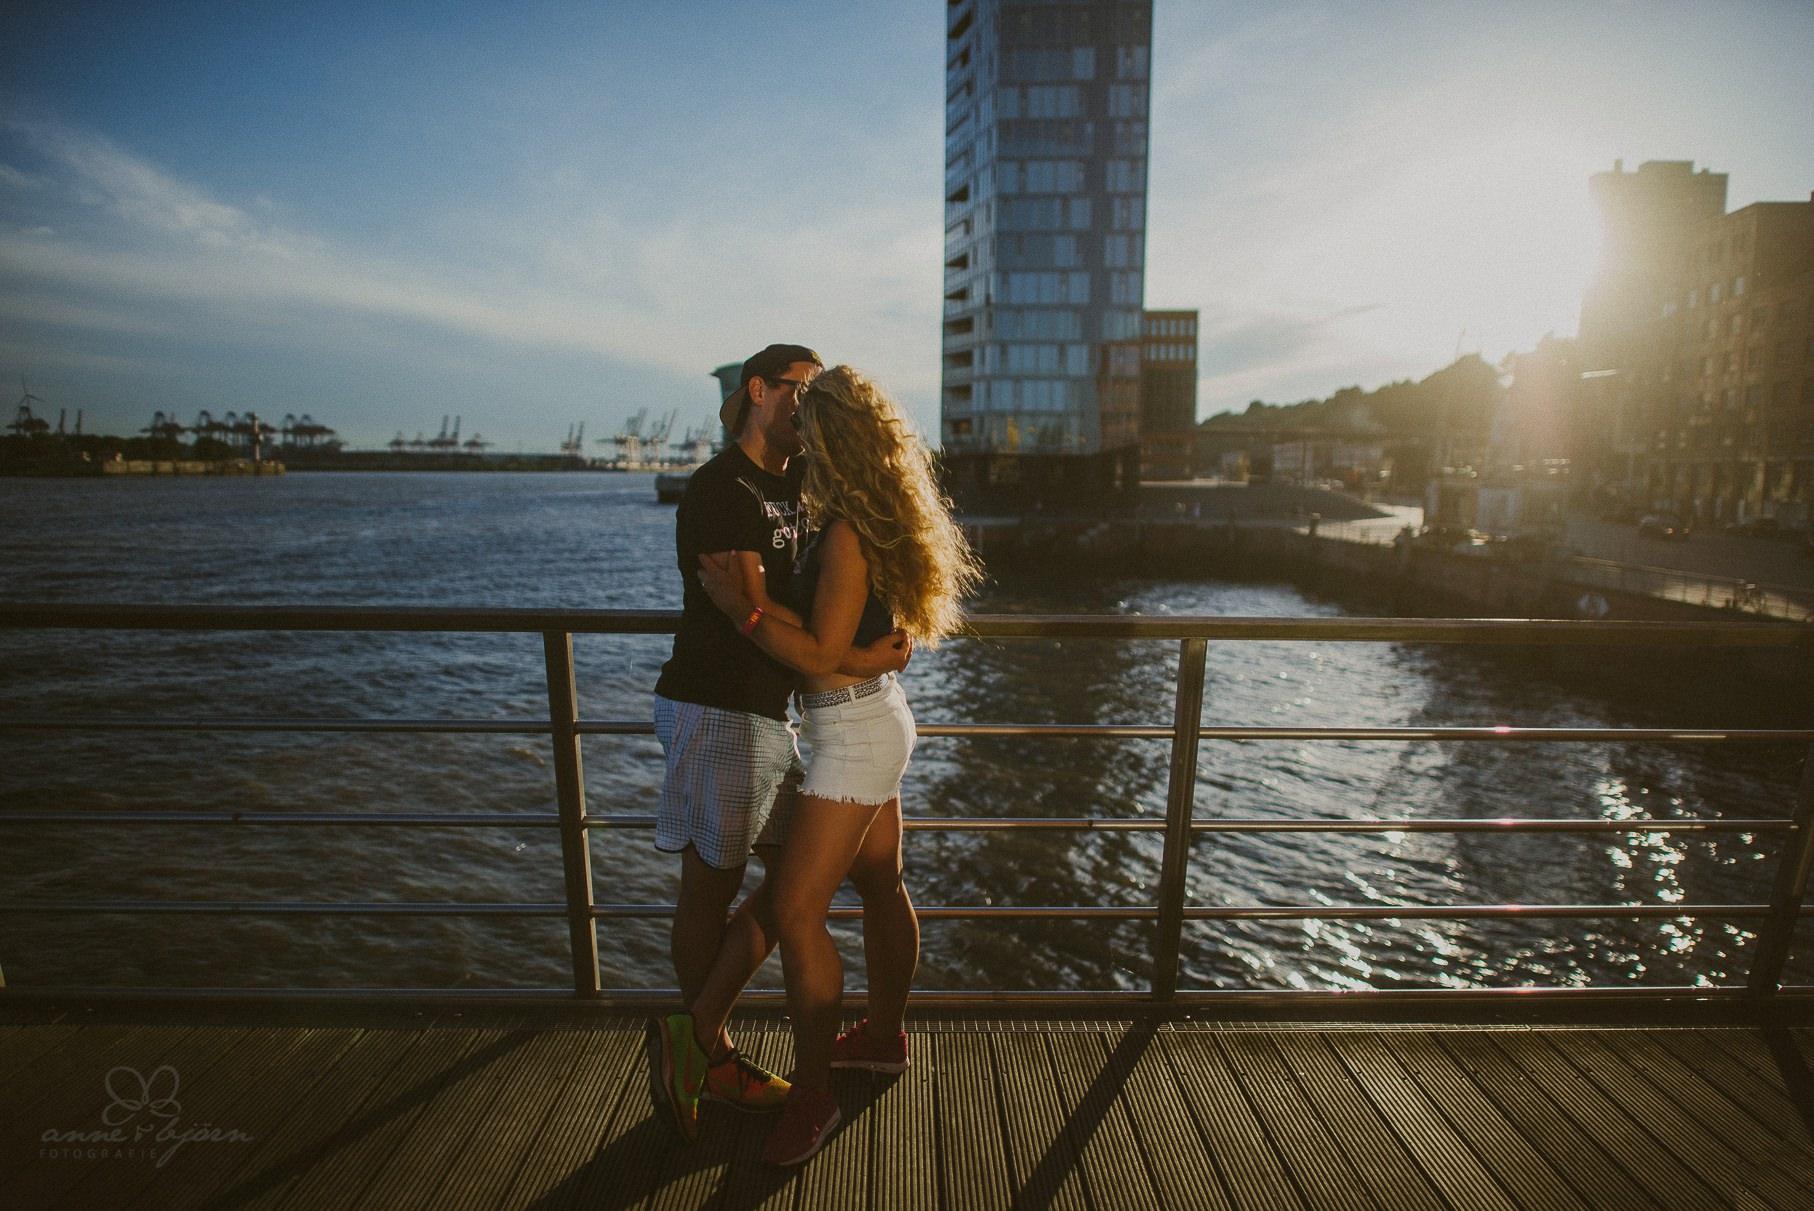 0026 dany und basti engagement hh d75 5084 bearbeitet - Sommerliches Verlobungsshooting in Hamburg - Dany & Basti